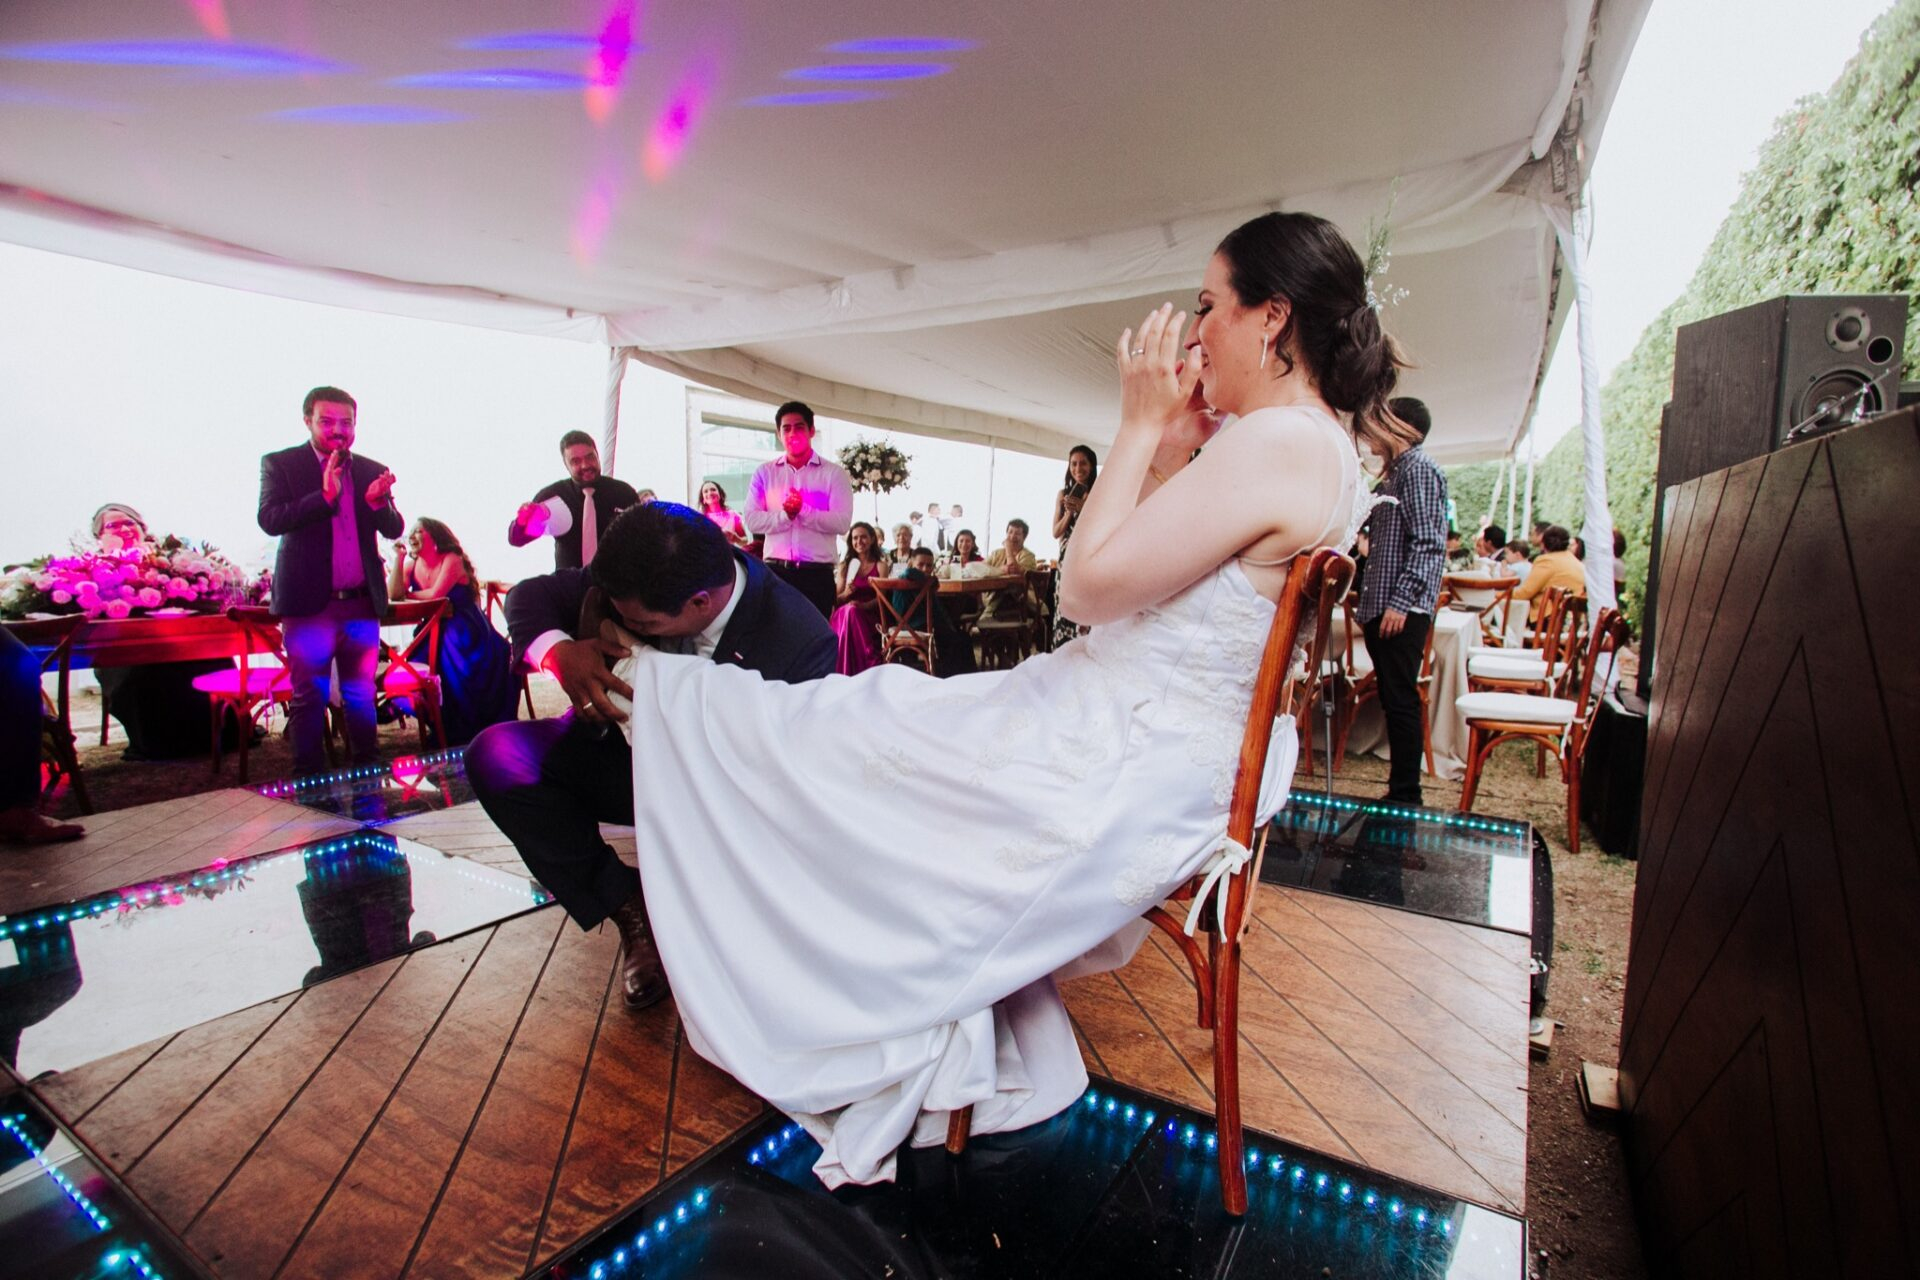 javier_noriega_fotografo_bodas_centro_platero_zacatecas_wedding_photographer40